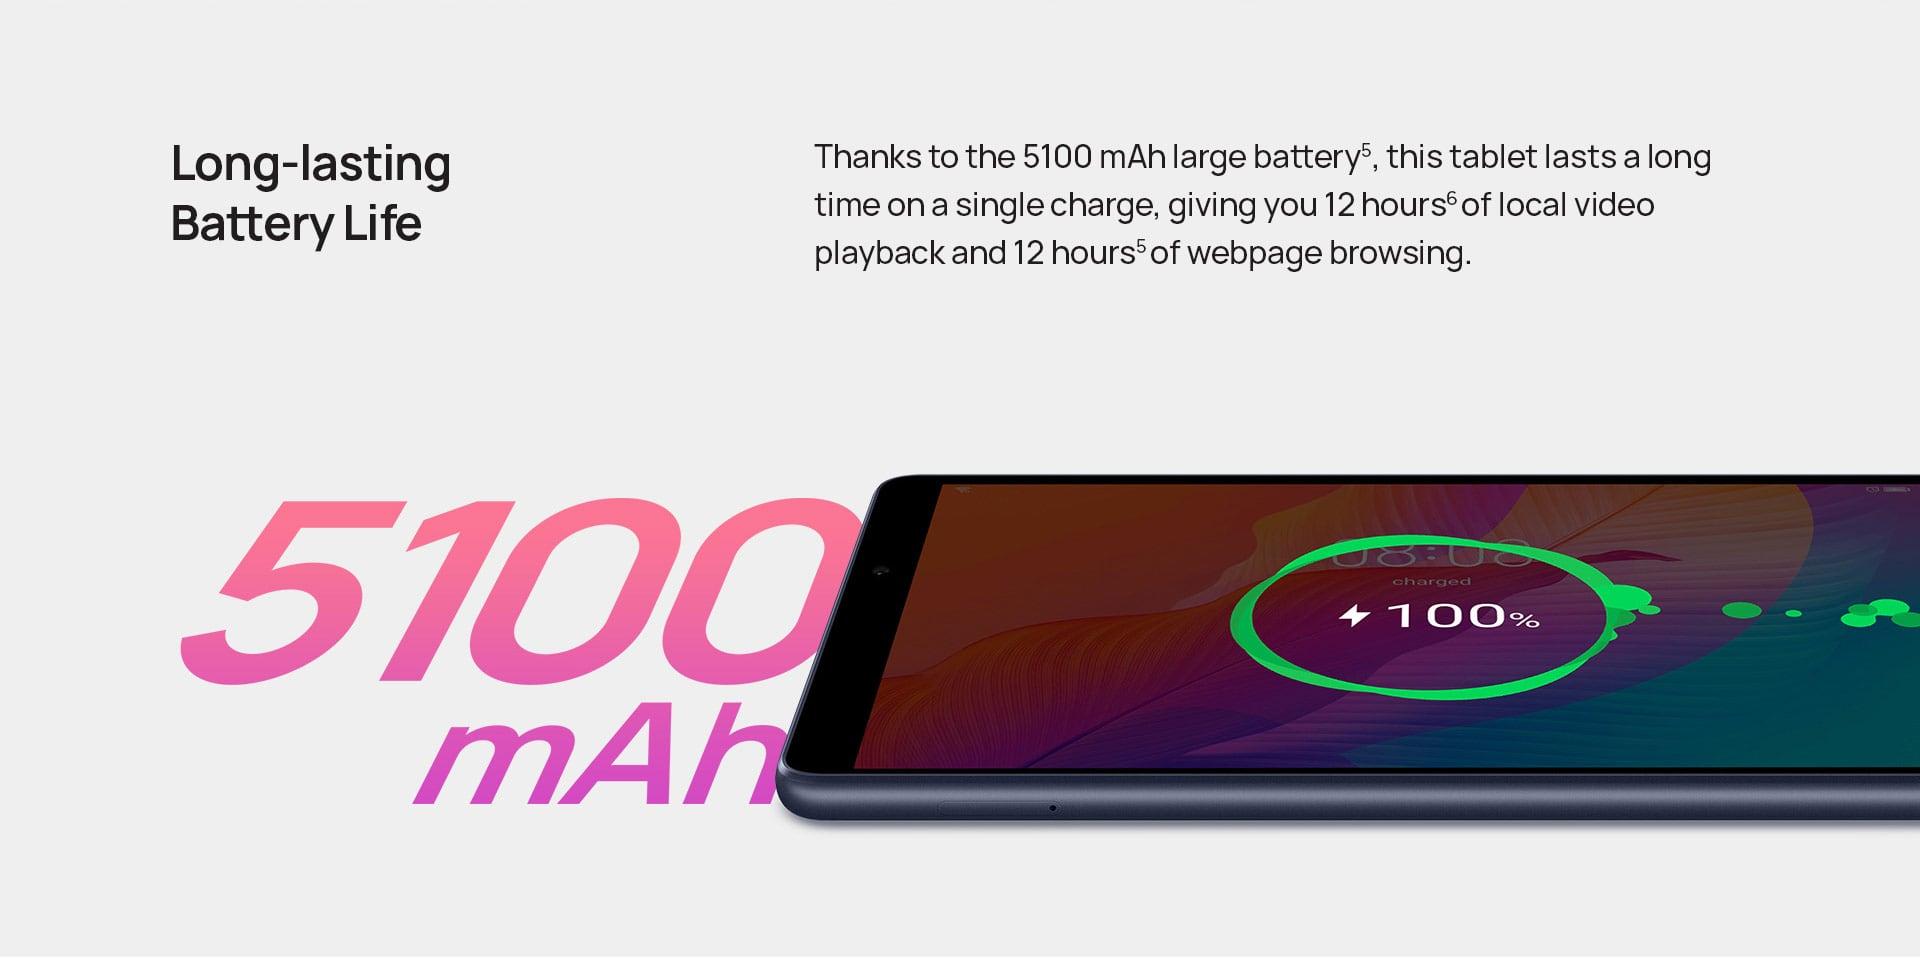 Huawei MatePad 及 MatePad T8 今天起发售,价格 RM599 起,赠品最高价值超过 RM250 6